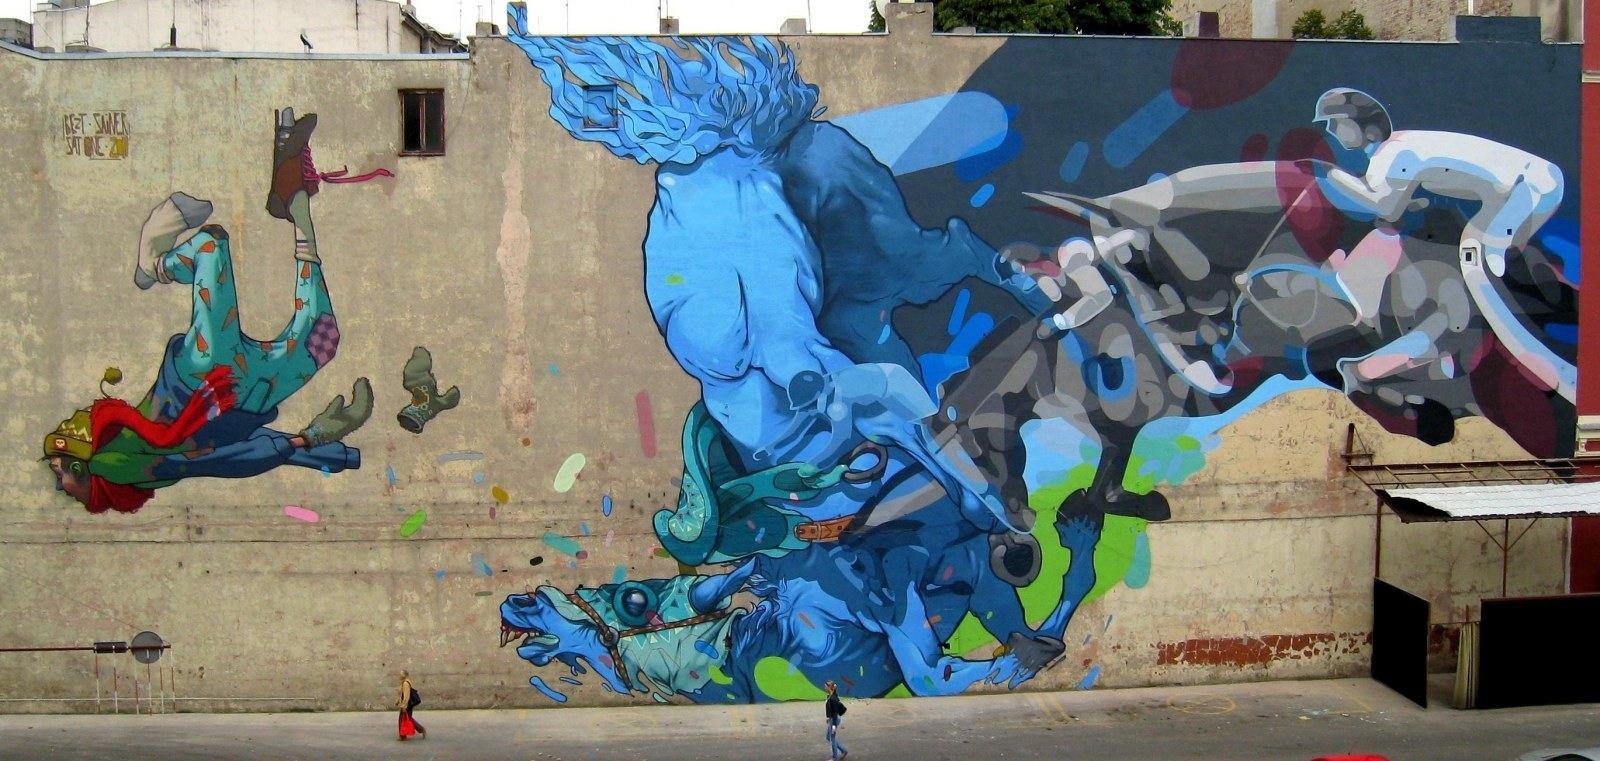 etam-cru-bezt-sainer-street-art-large-murals-07